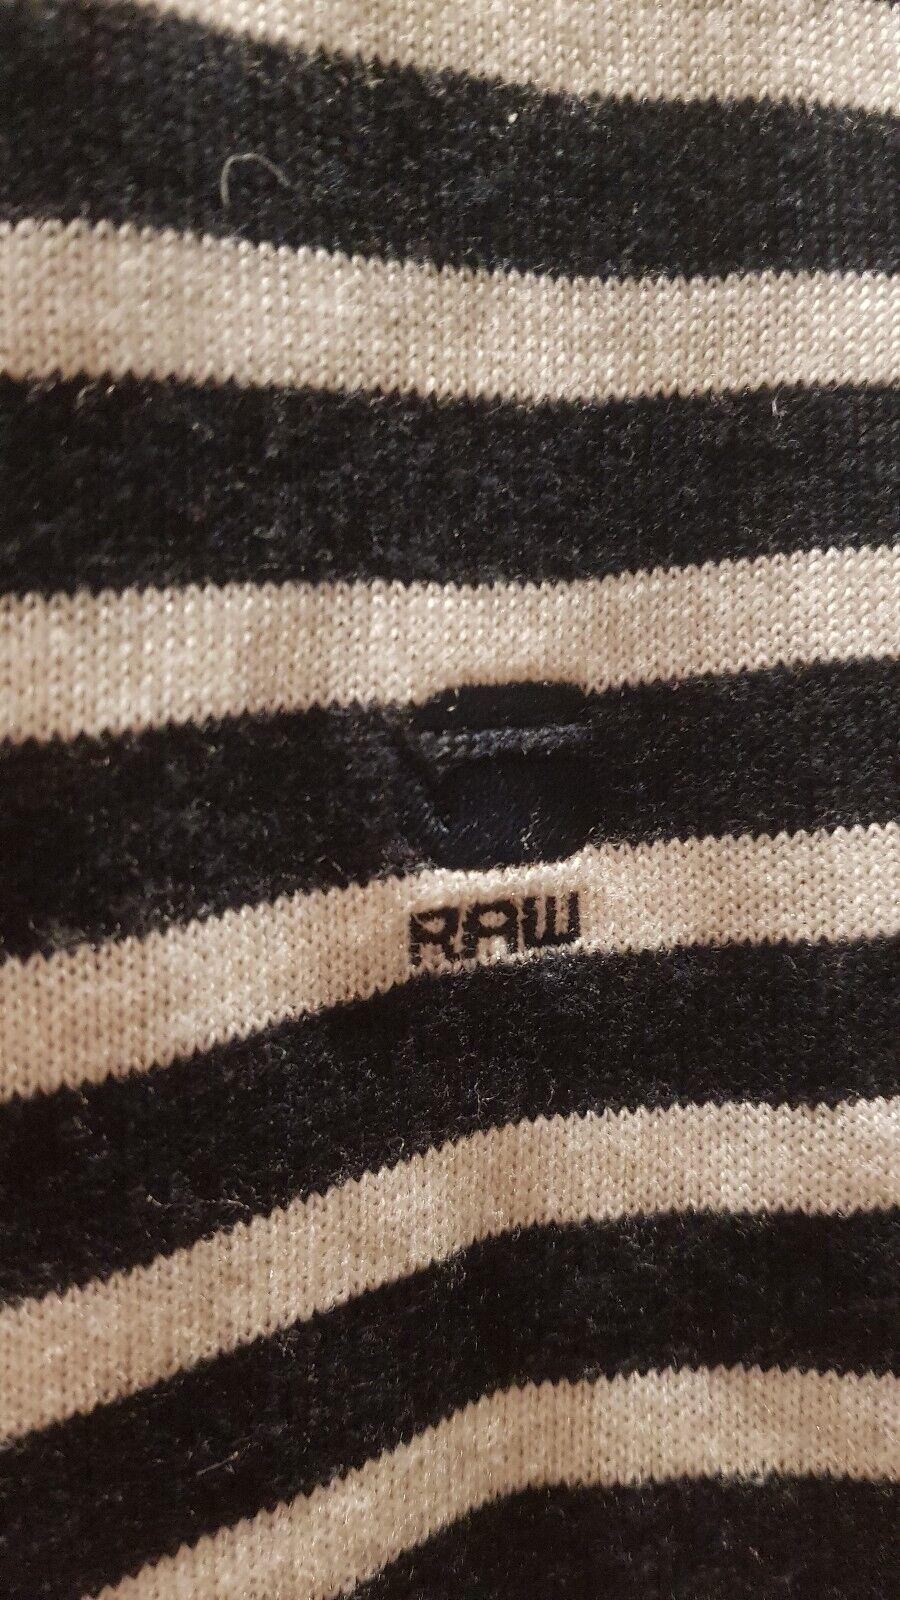 G Star RAW Pullover XXL NEU | | | Haltbarer Service  10381d